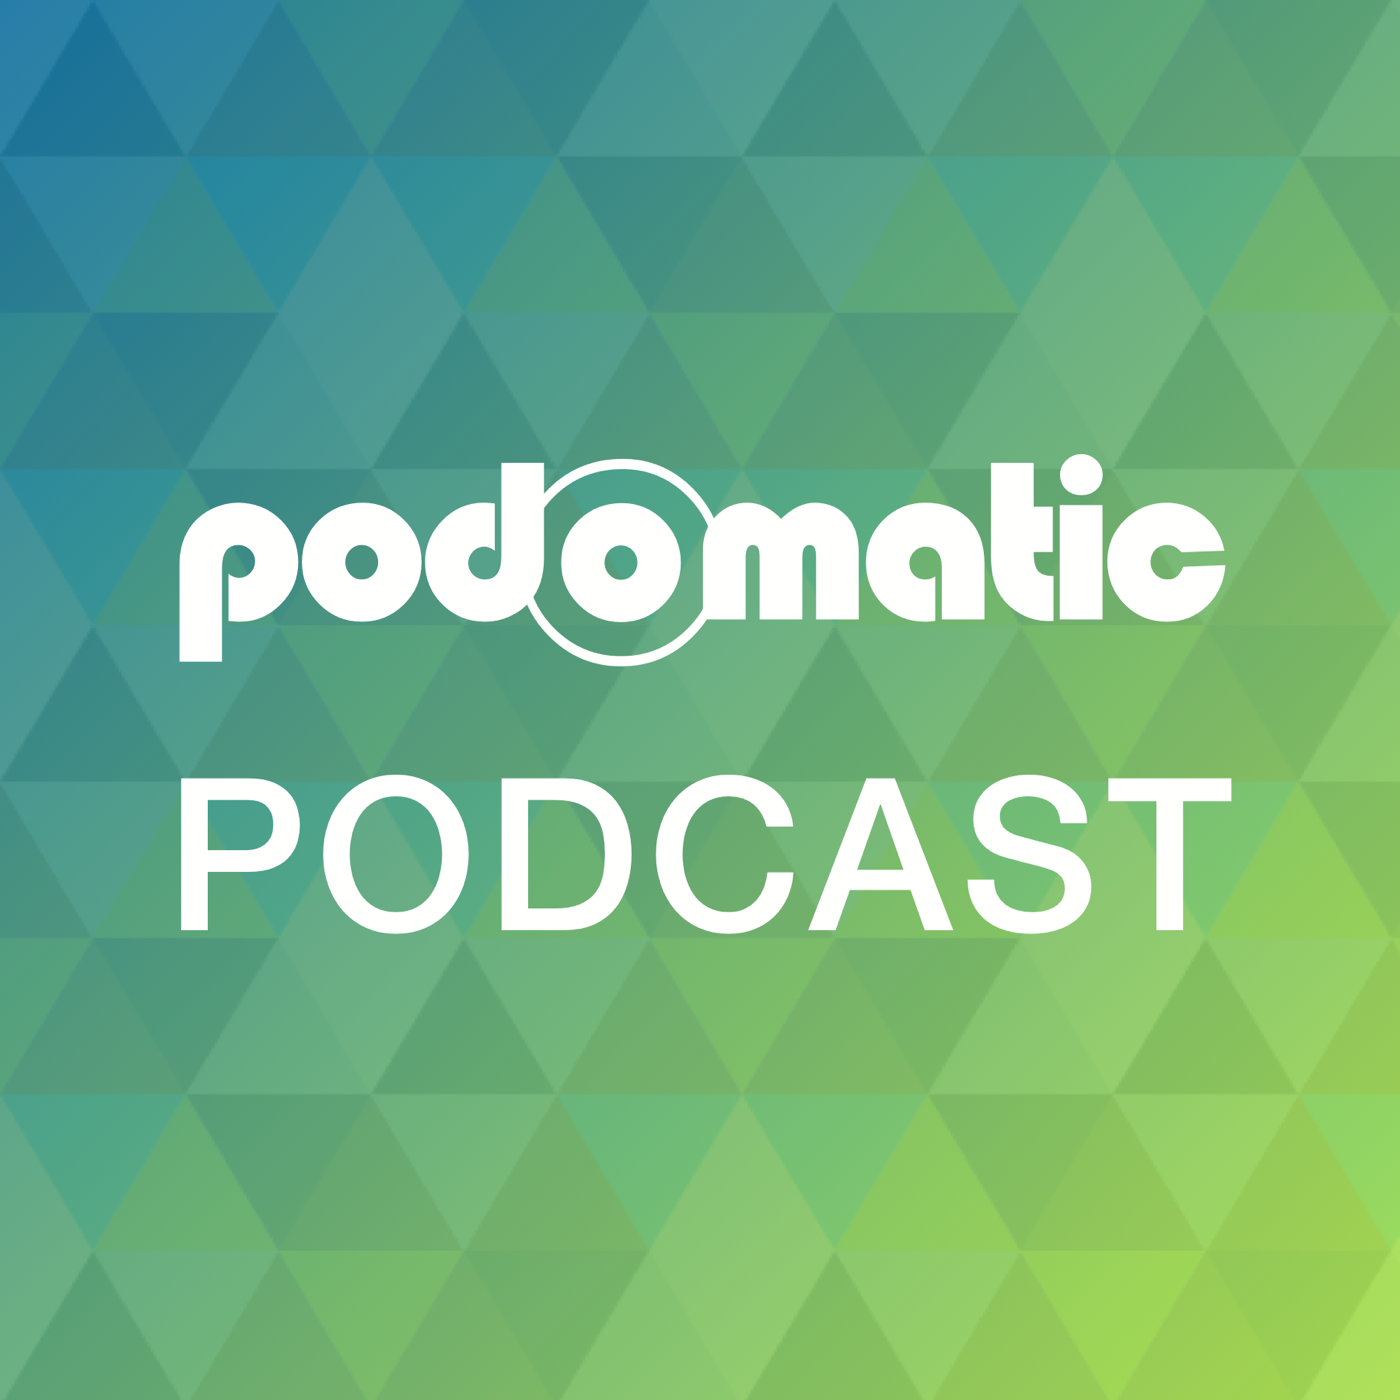 denise funk's Podcast